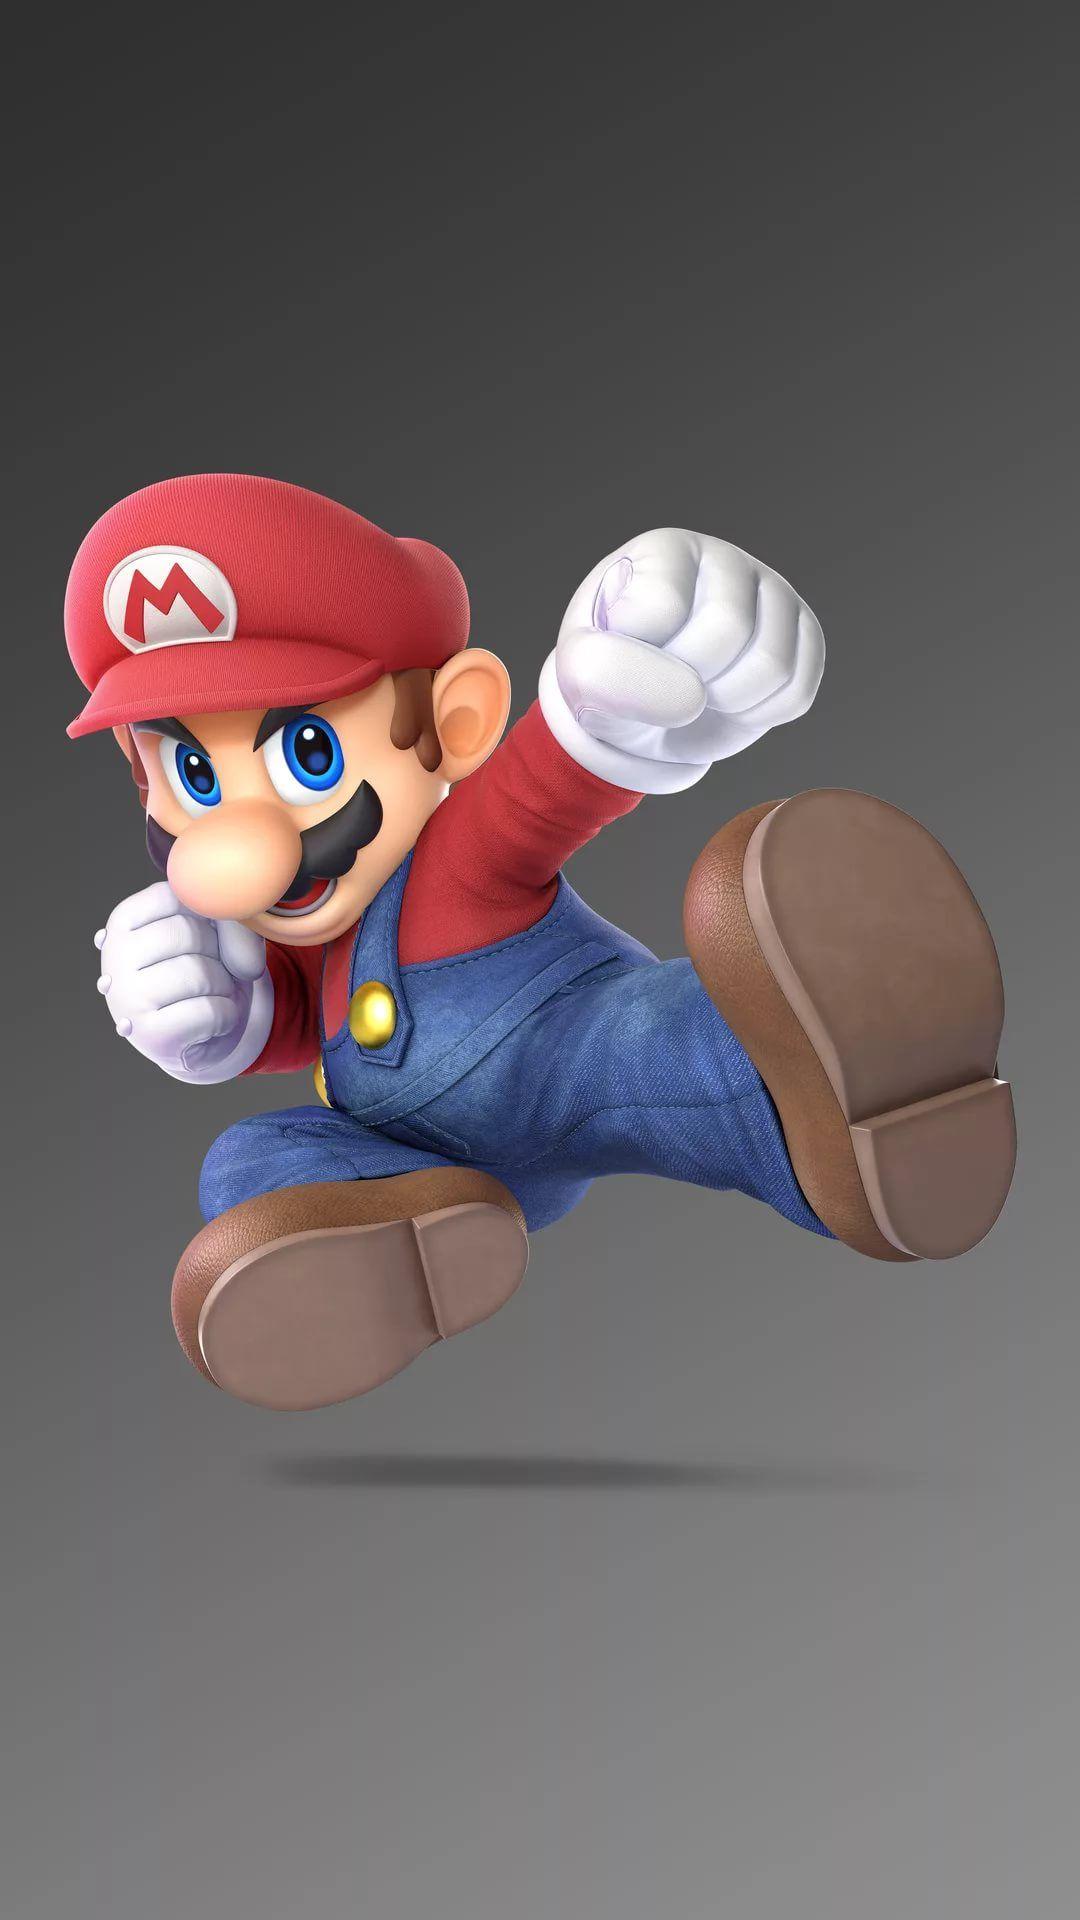 Mario iPhone wallpaper